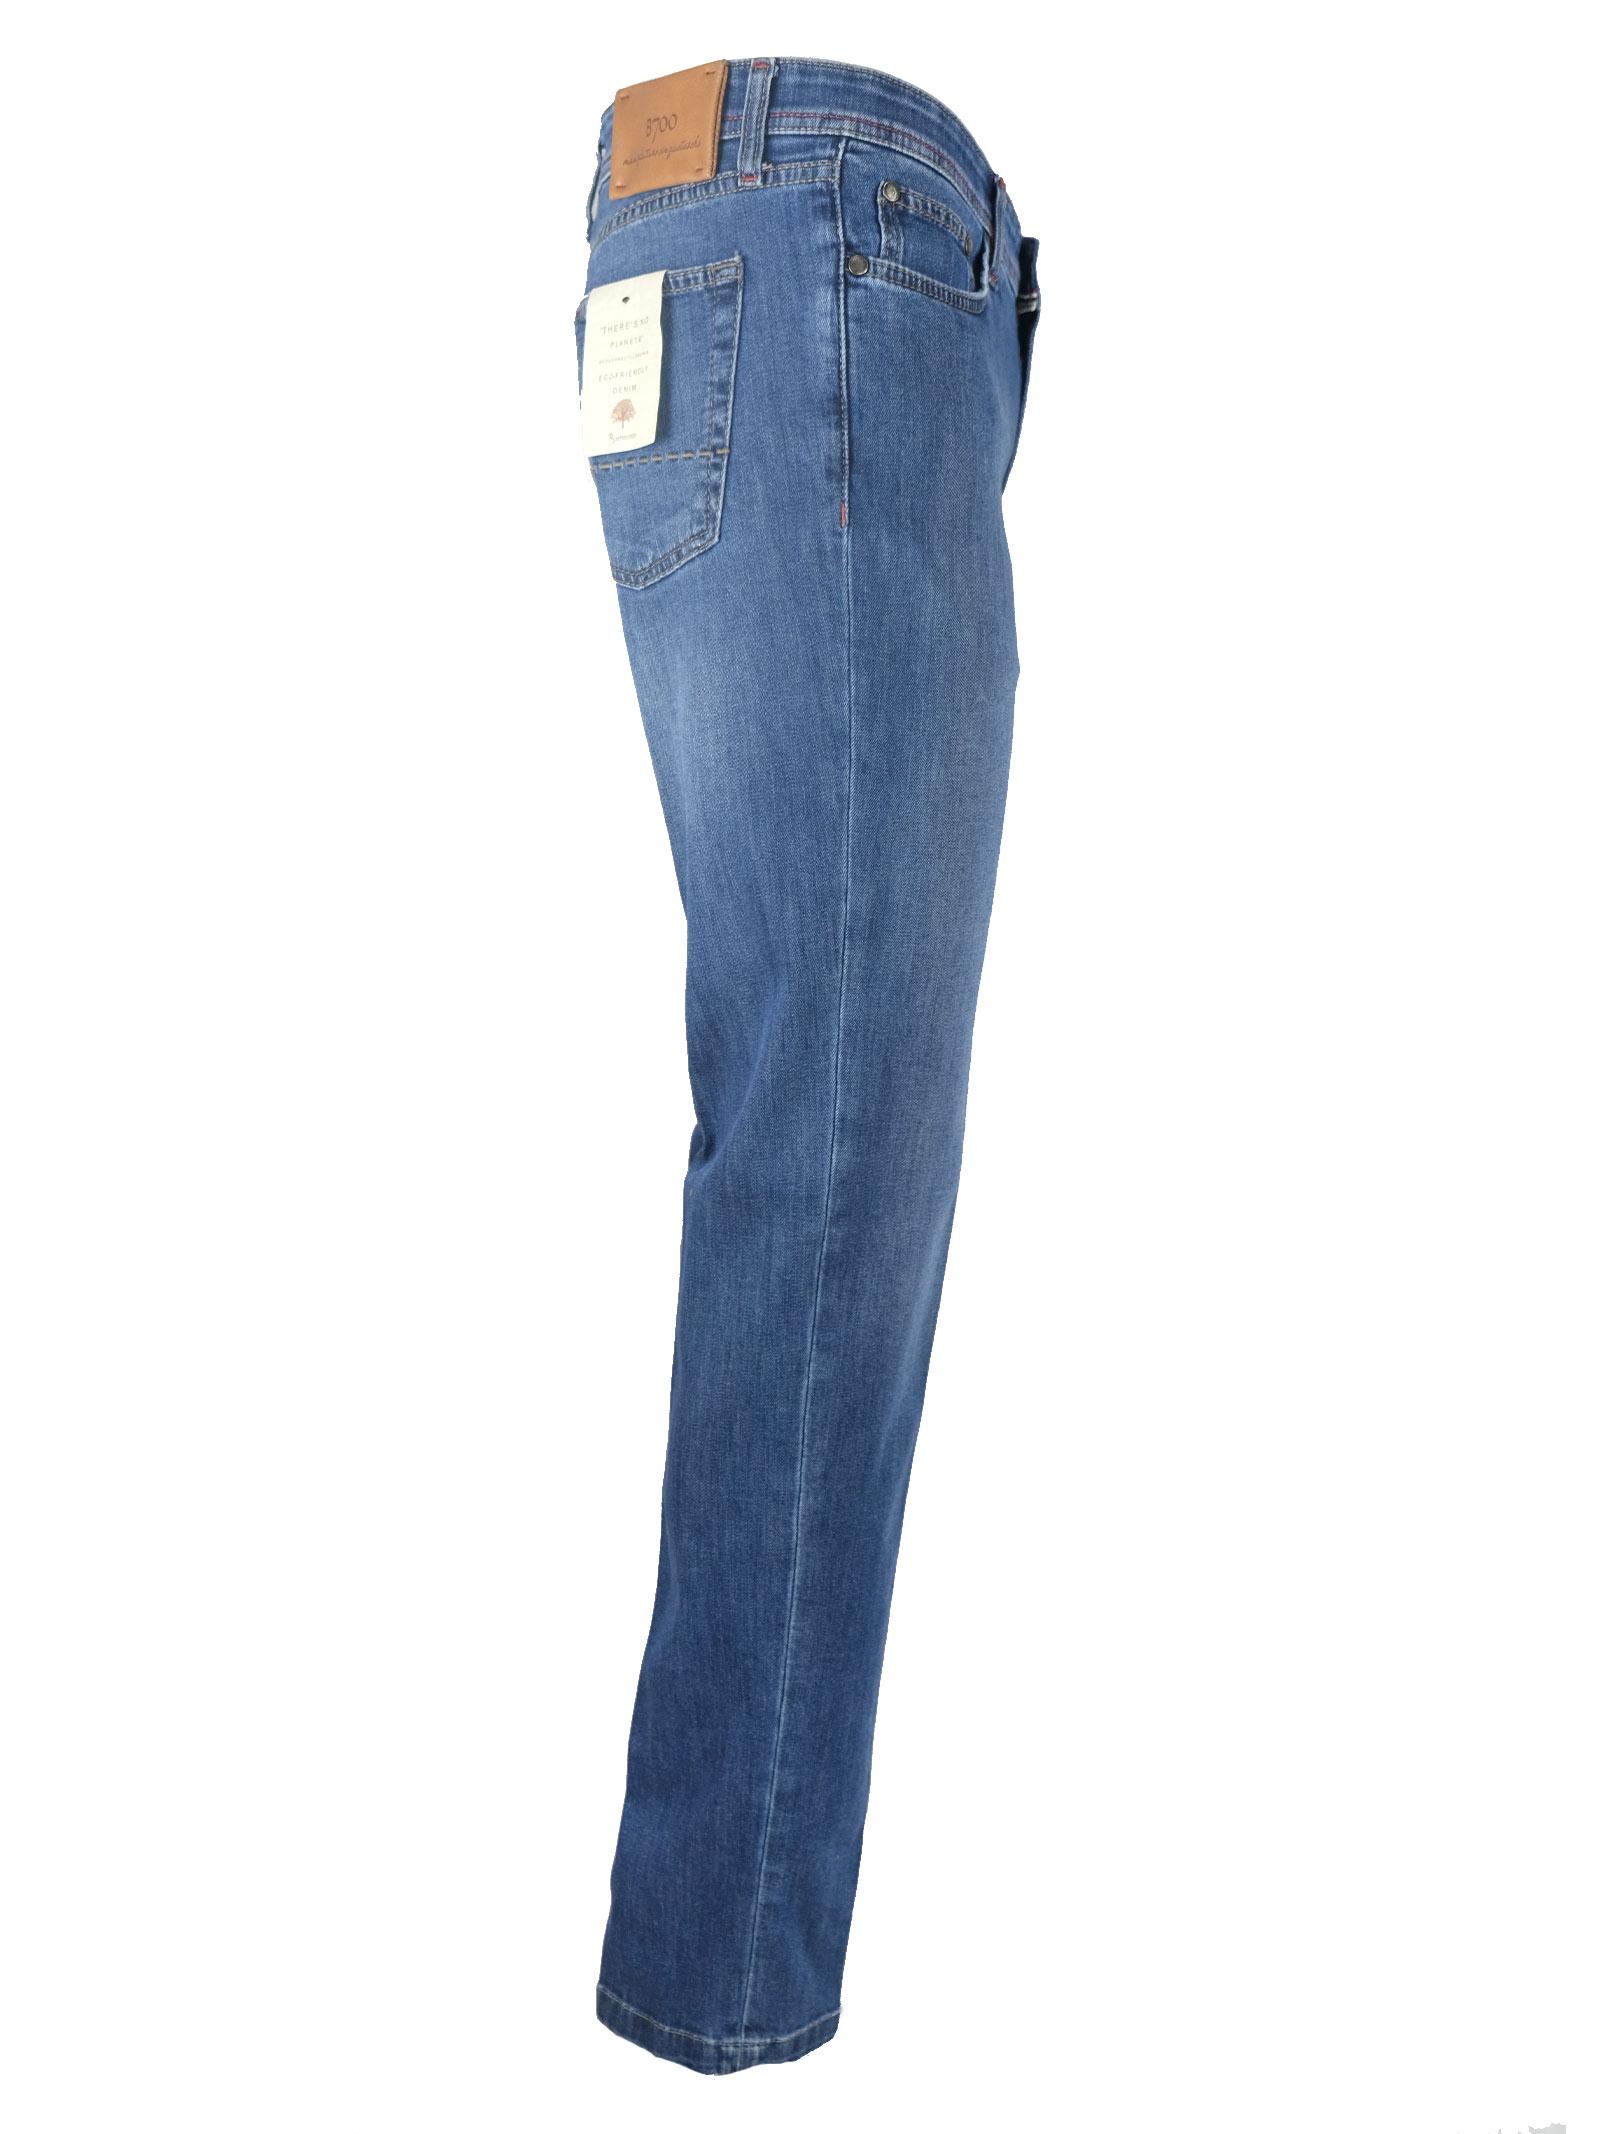 8  OZ. LIGHT DENIM JEANS B700 | Jeans | JR704 9026102